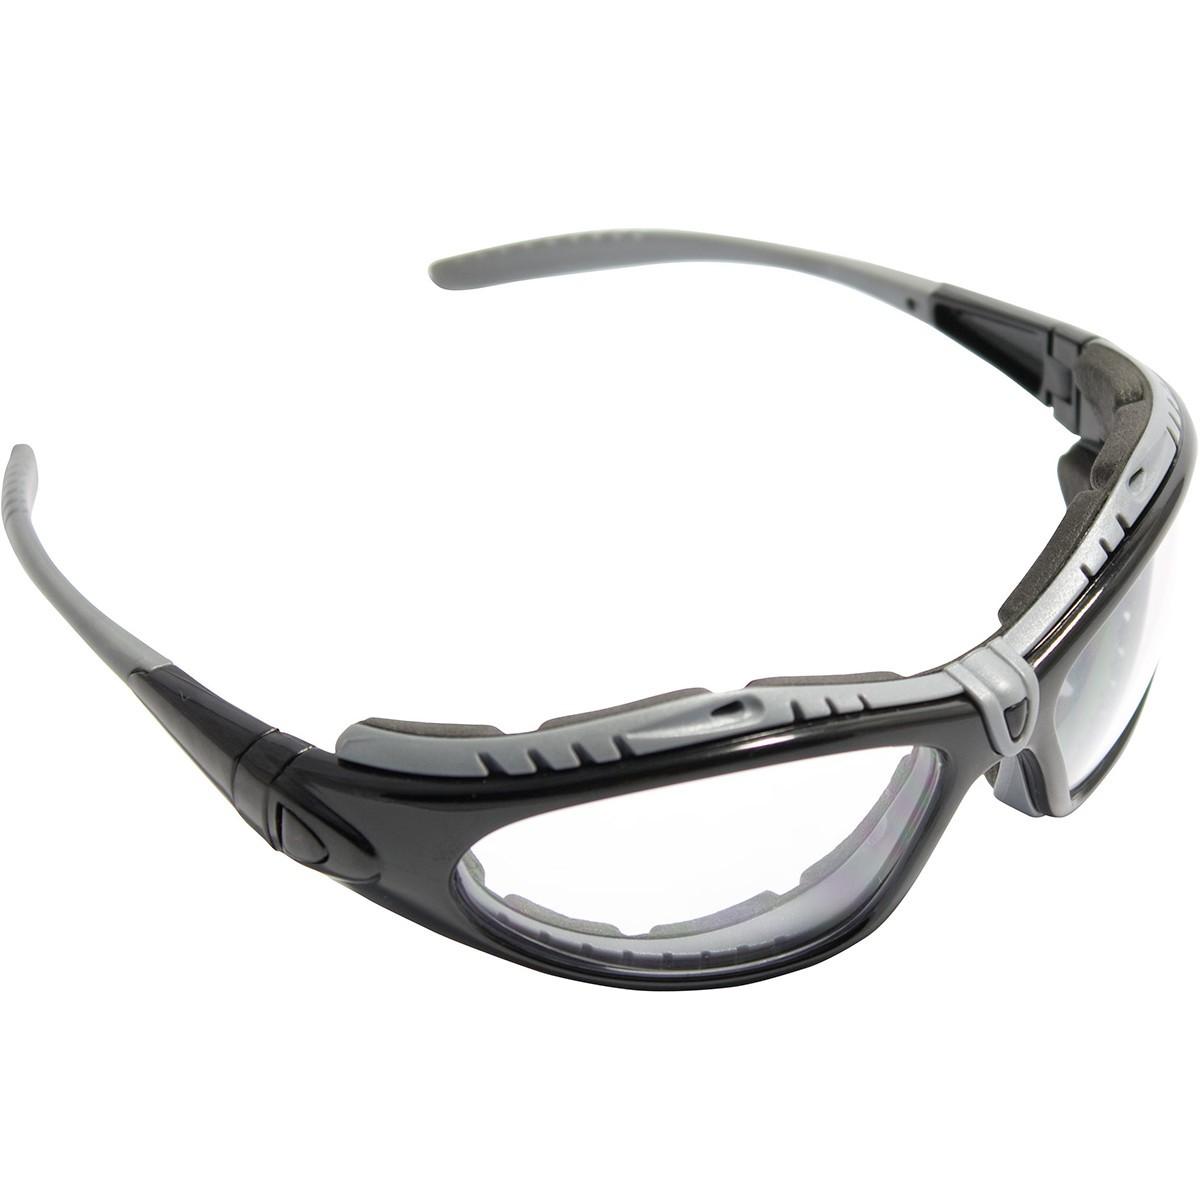 c424c7b478 Bouton Safety Glasses